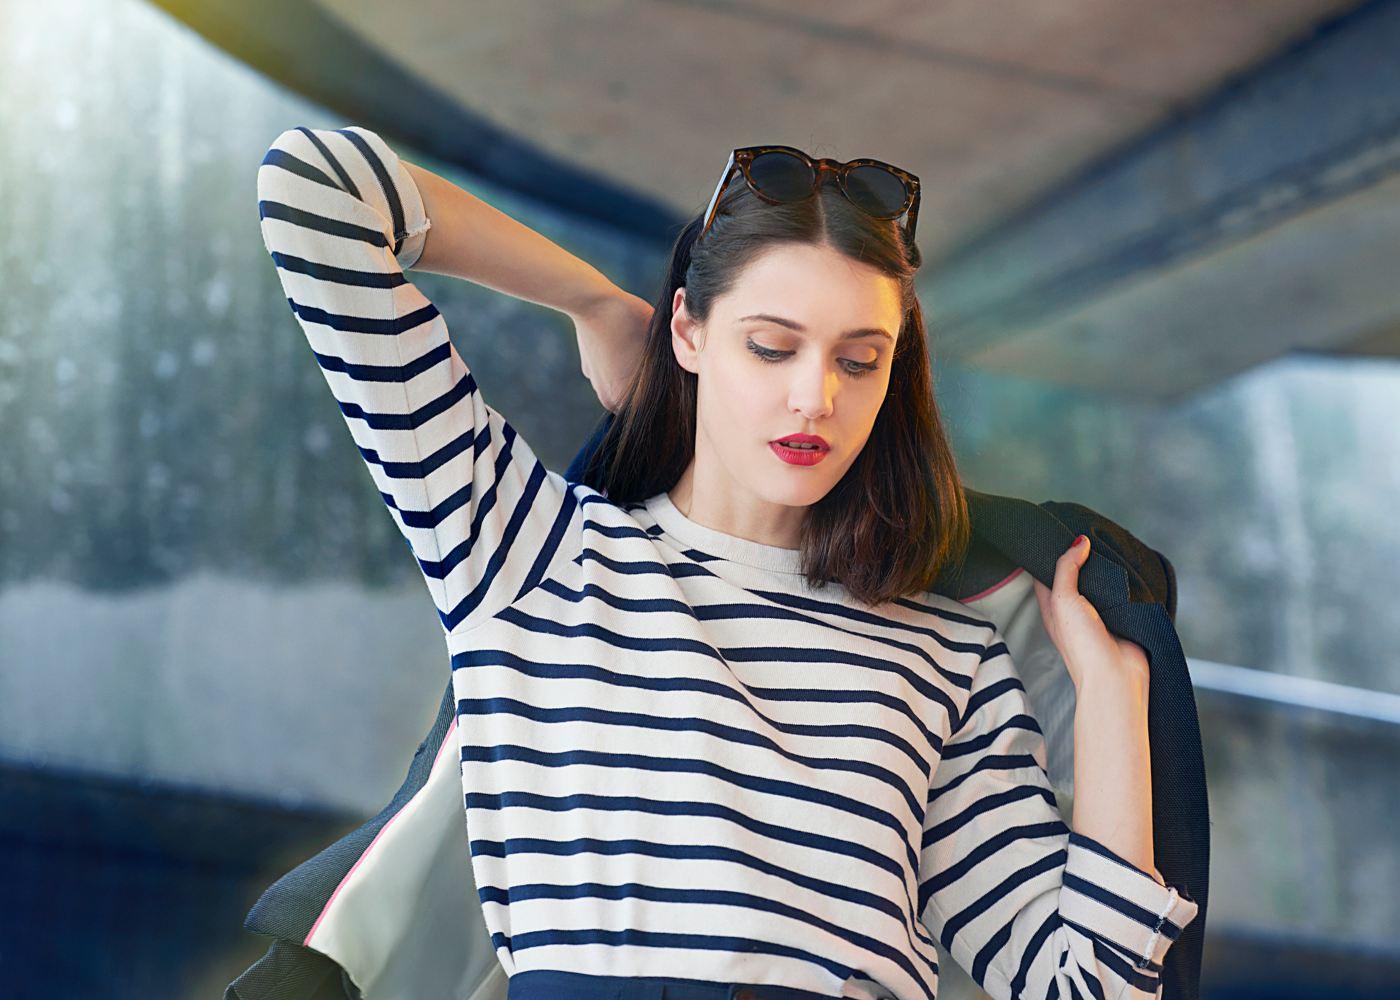 Como Usar Camisa Estampada: Monte Looks Incríveis | Moda